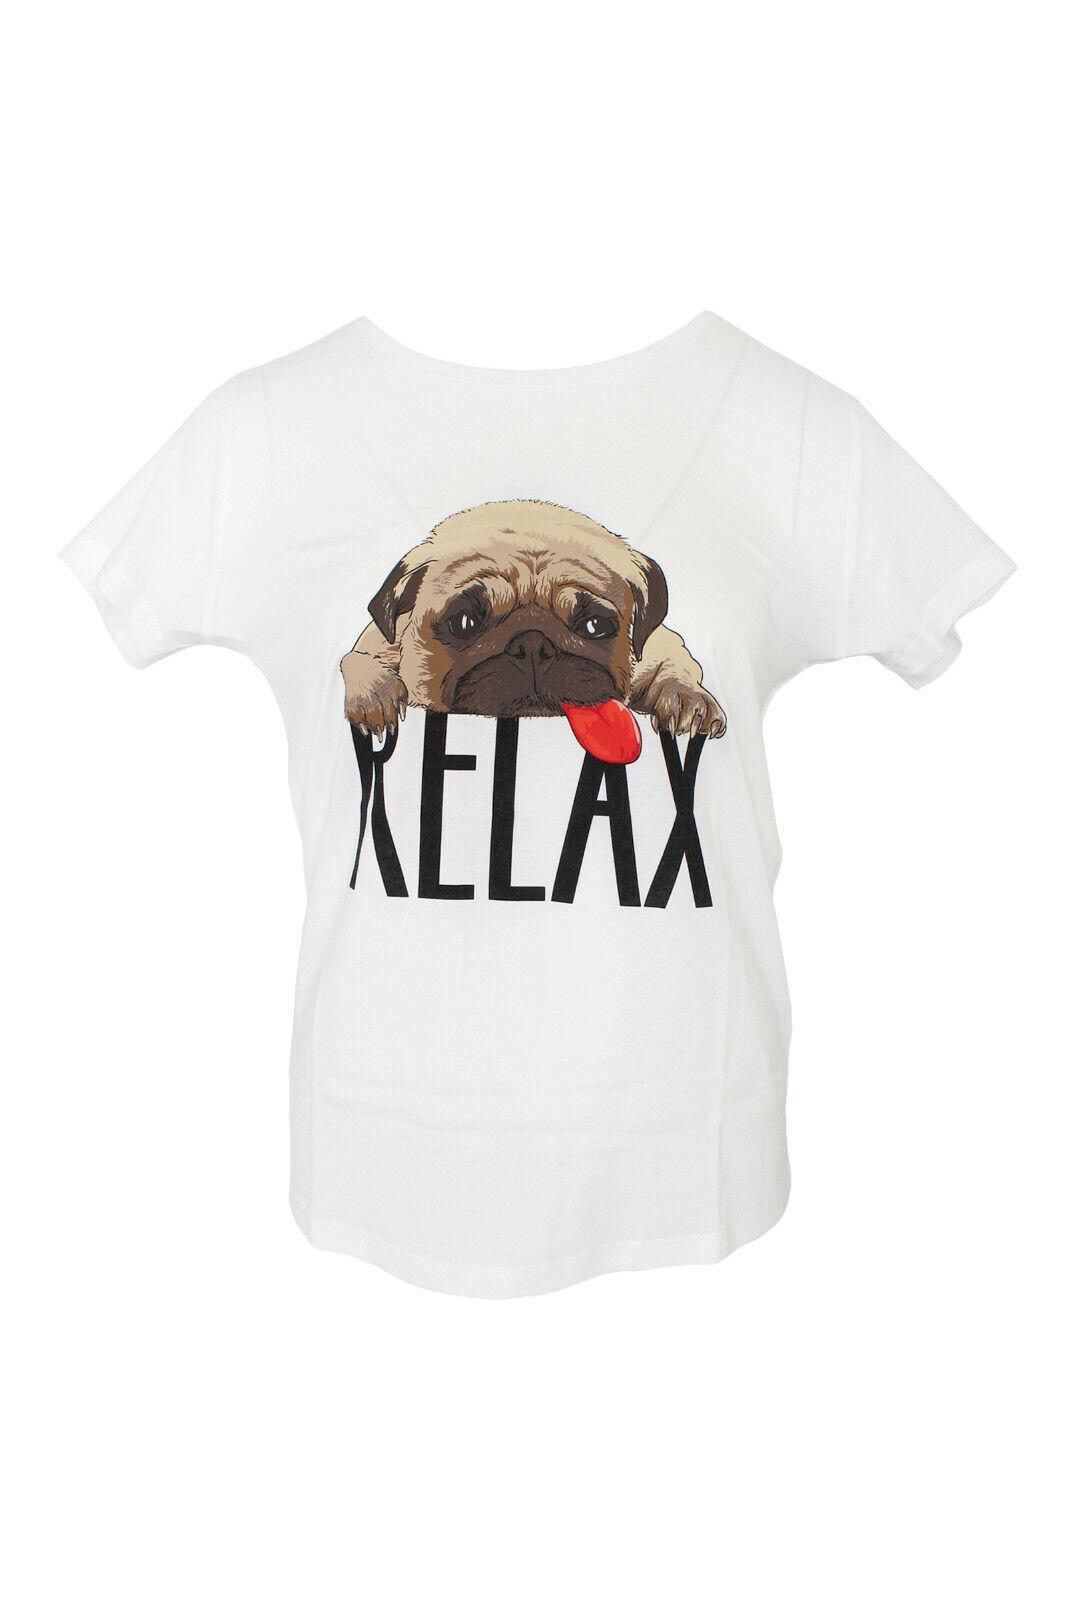 Quantum Courage - RELAX Shirt - white - NEW